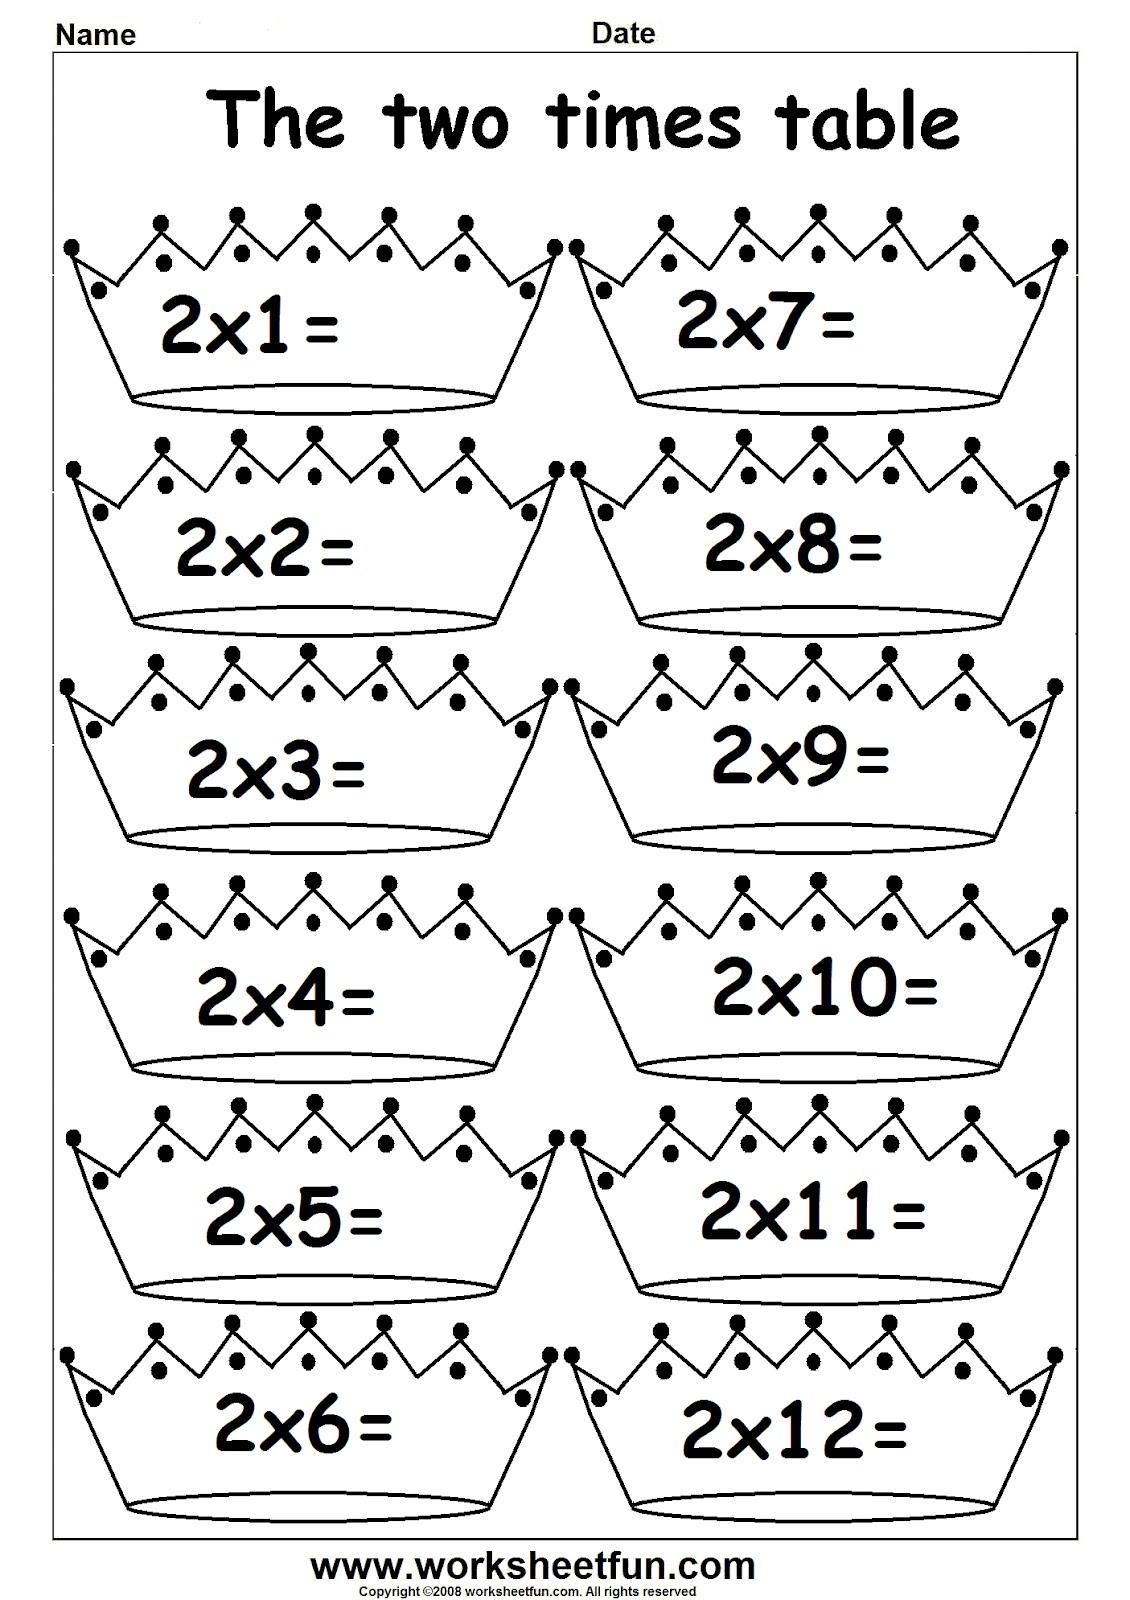 Free Worksheet Histogram Worksheets histogram worksheet 6th grade workbook site of a box and whisker plot free printable math worksheets